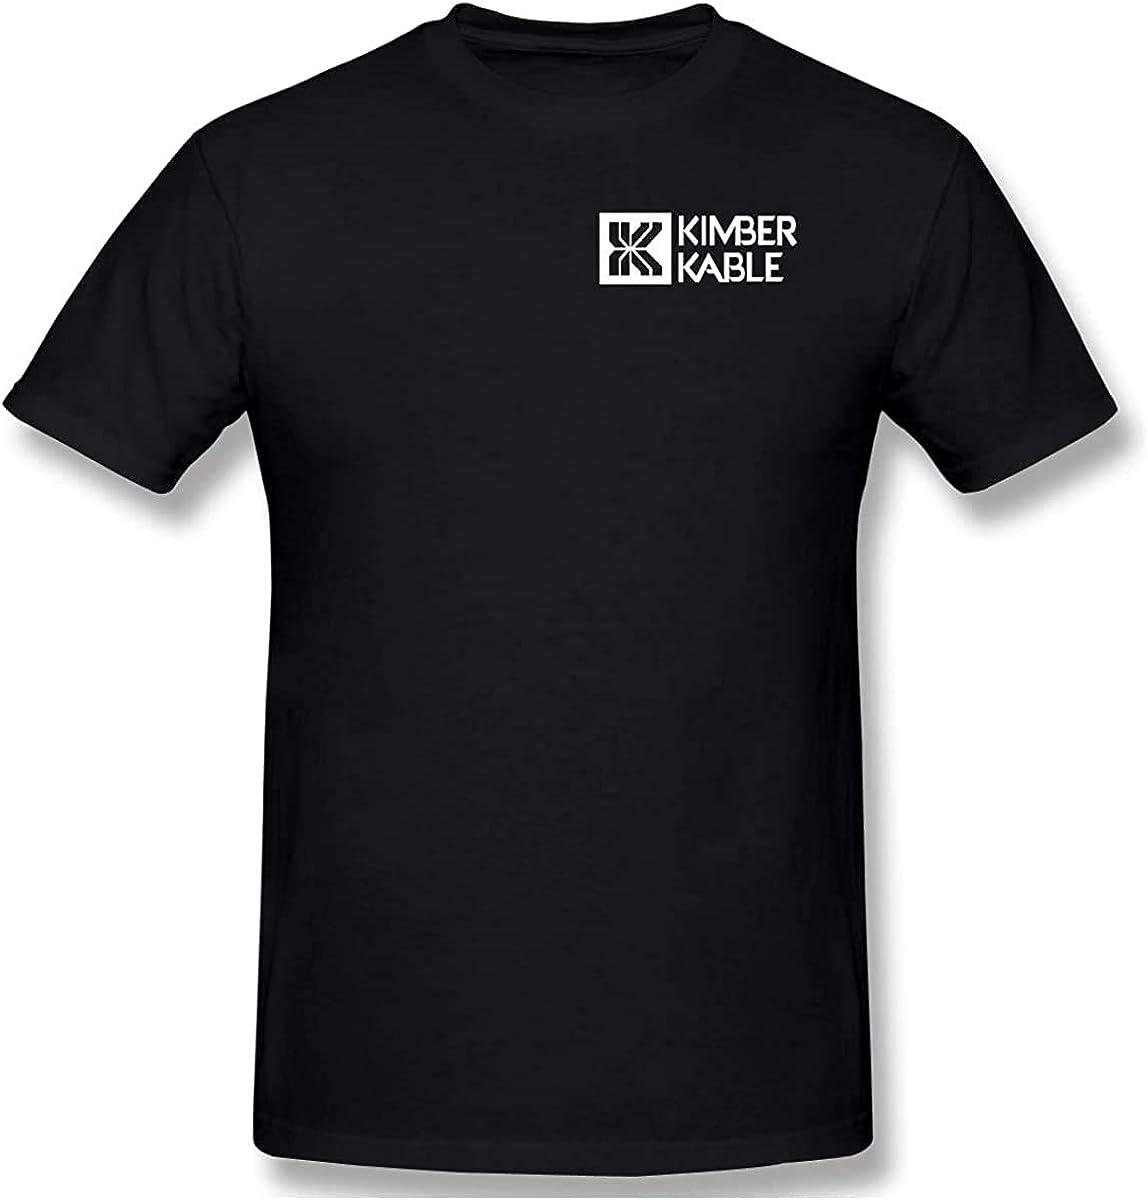 Kimber White Logo T Shirt 2nd Amendment Pro Gun Rights Pistol tee Black